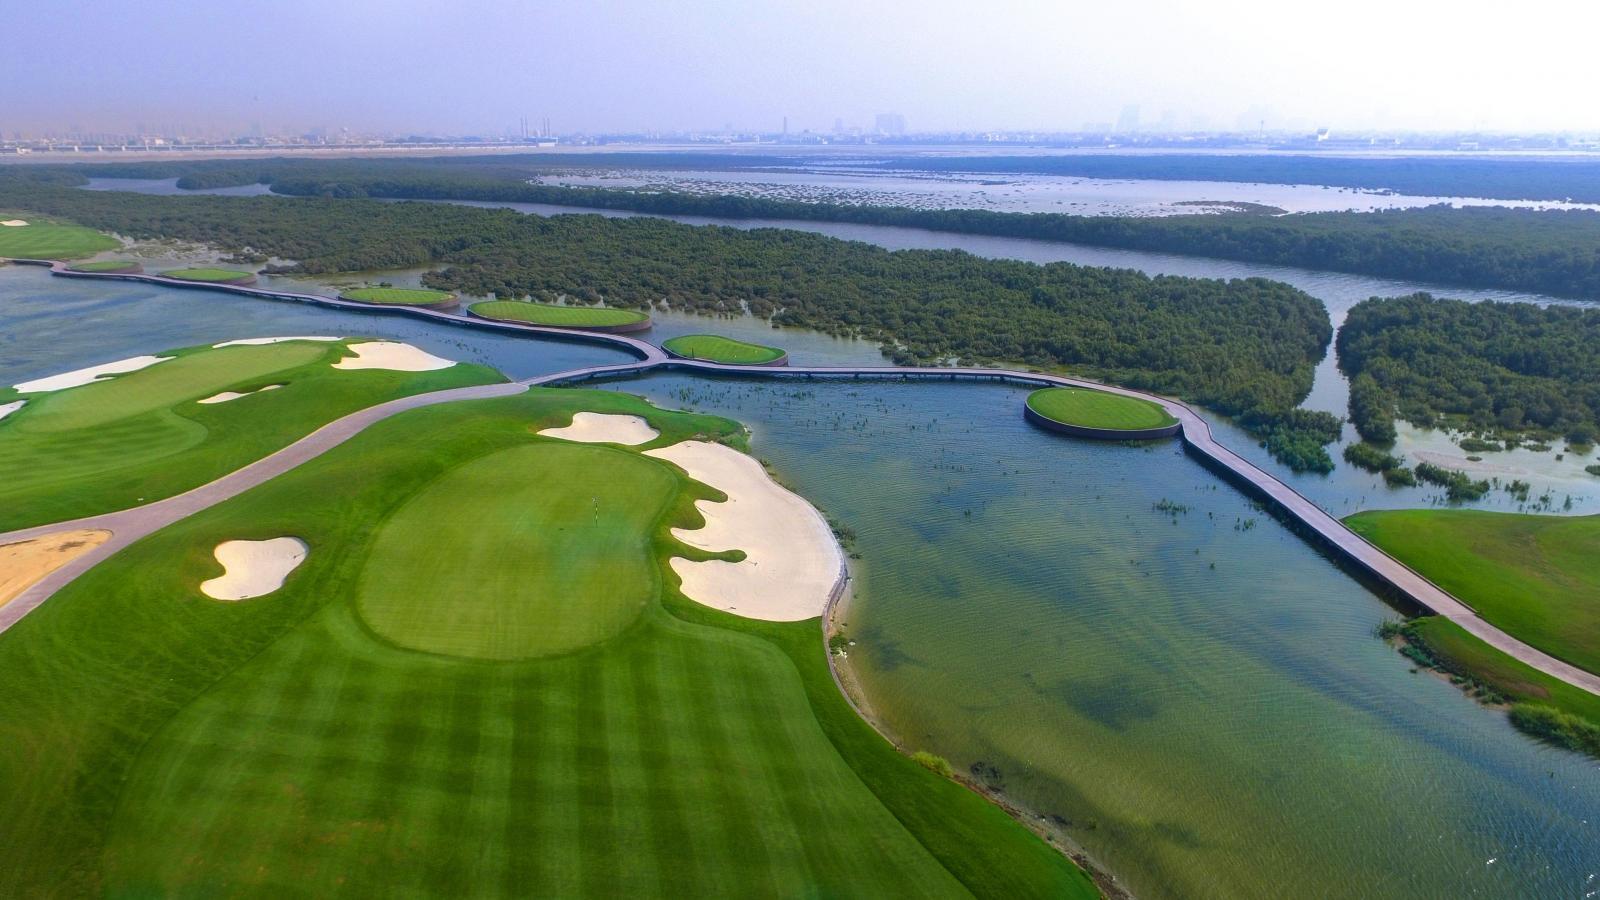 al-zorah-golf-club-68-xl